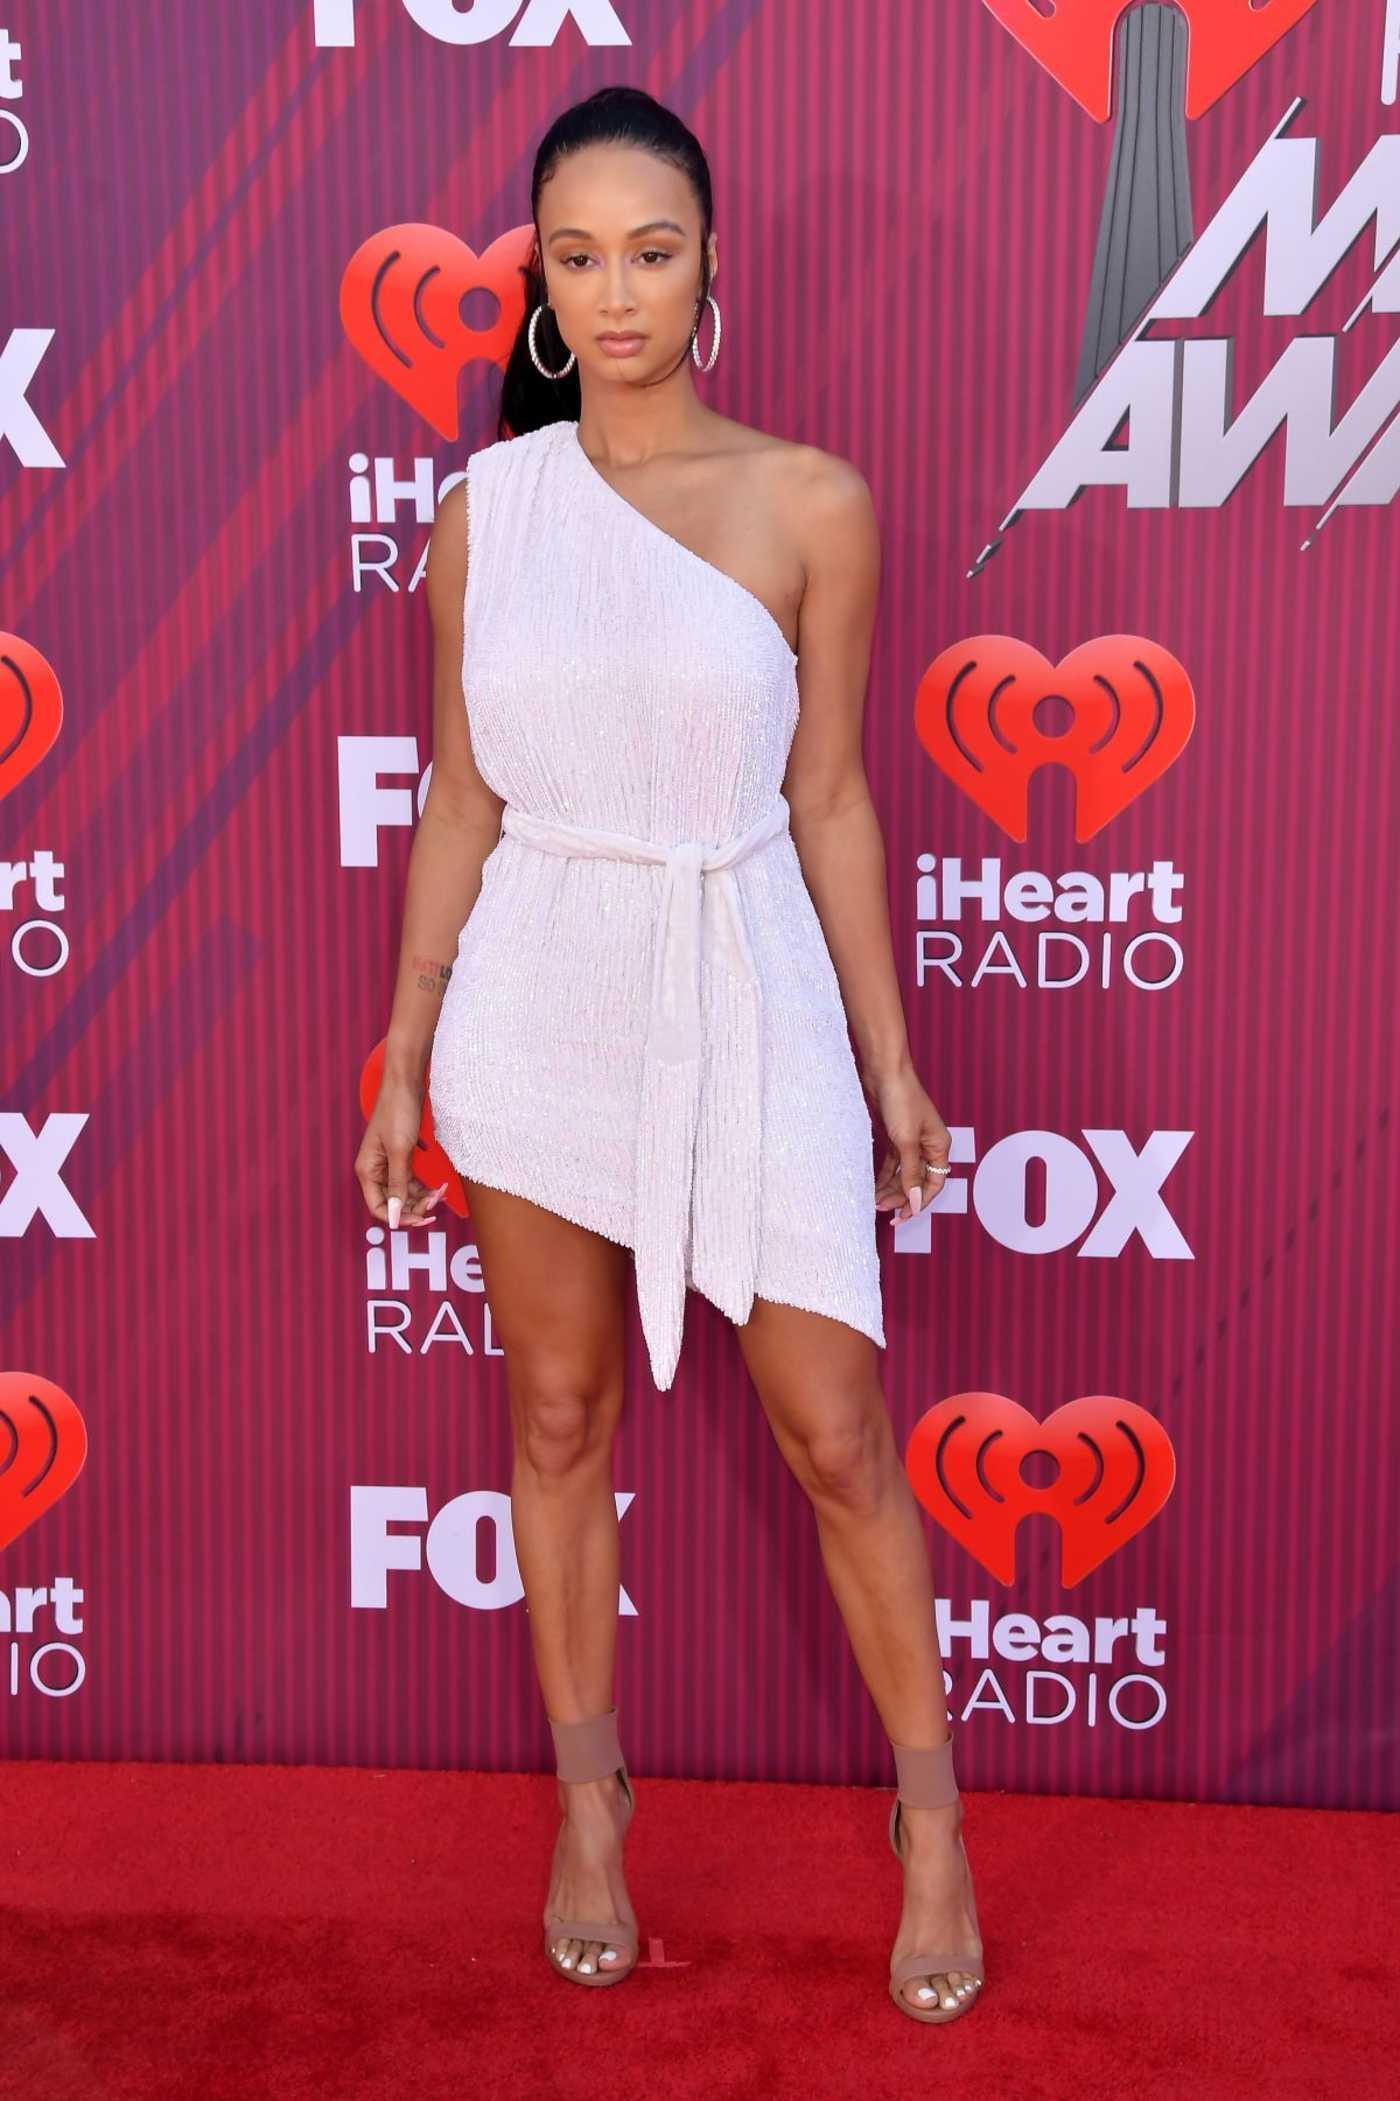 Draya Michele Attends 2019 iHeartRadio Music Awards at Microsoft Theater in LA 03/14/2019